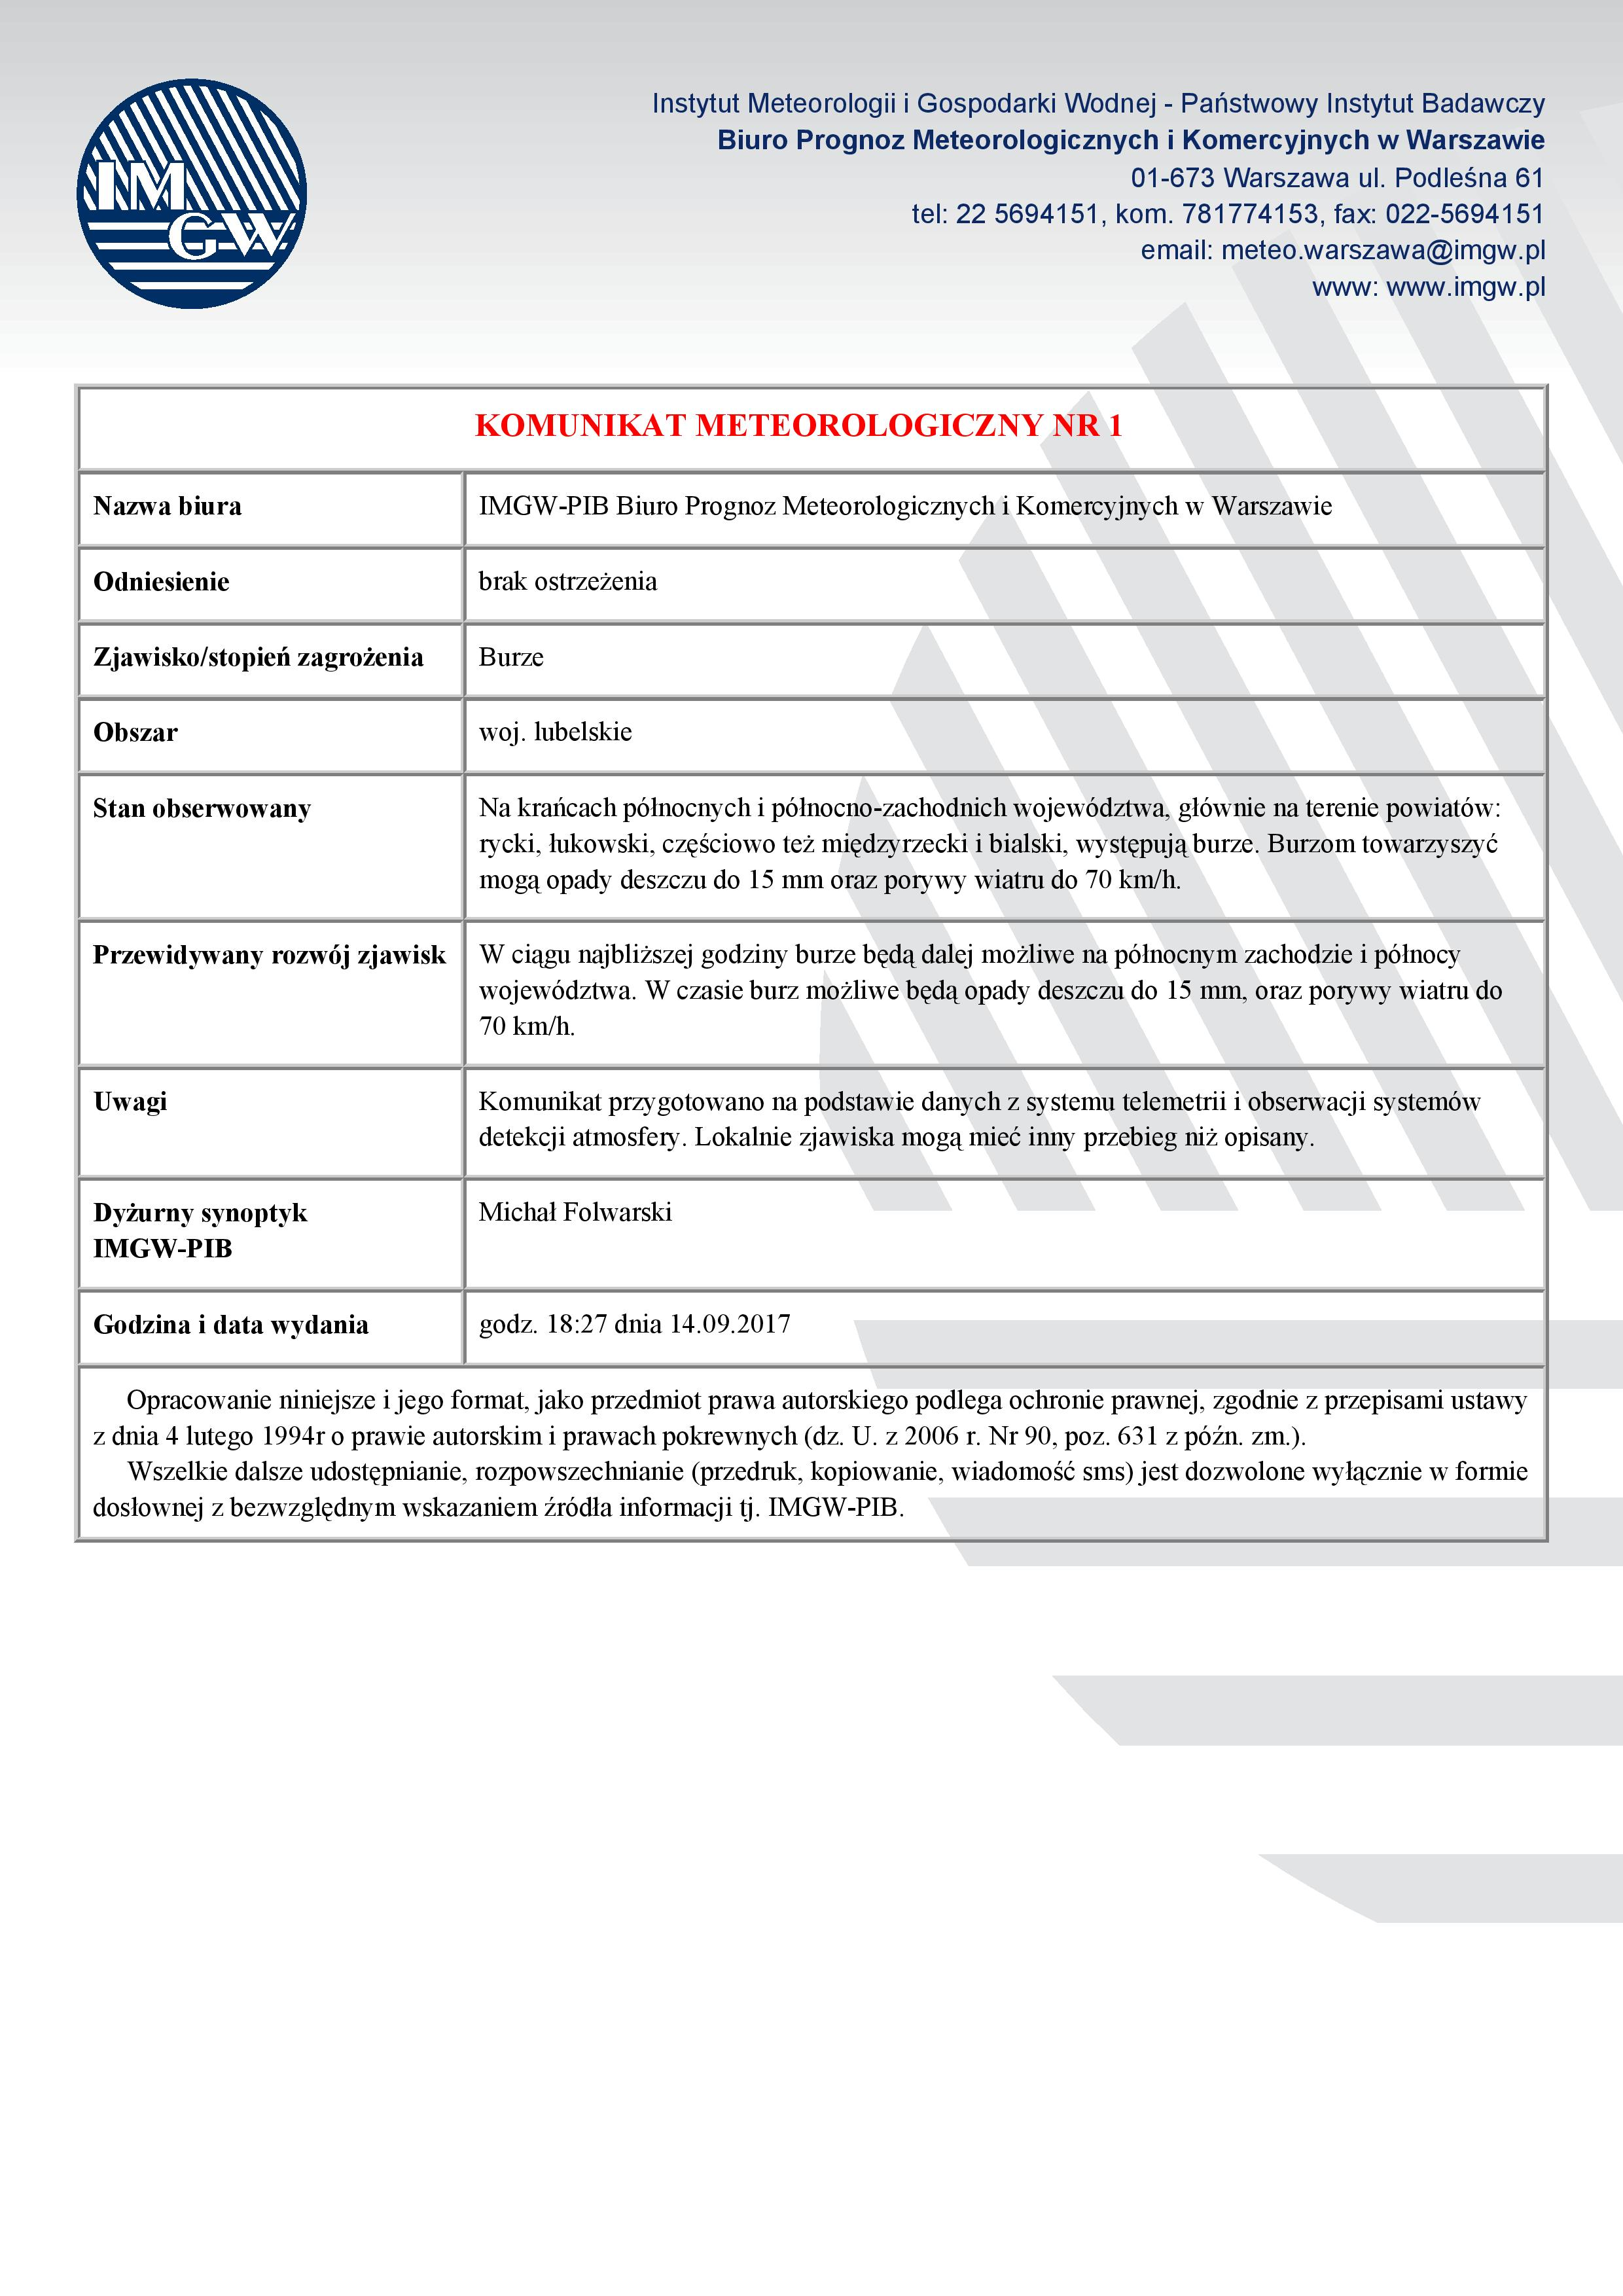 KOMUNIKAT METEOROLOGICZNY NR 1 z dn. 14.09.2017 r. [PDF, 64 KB]